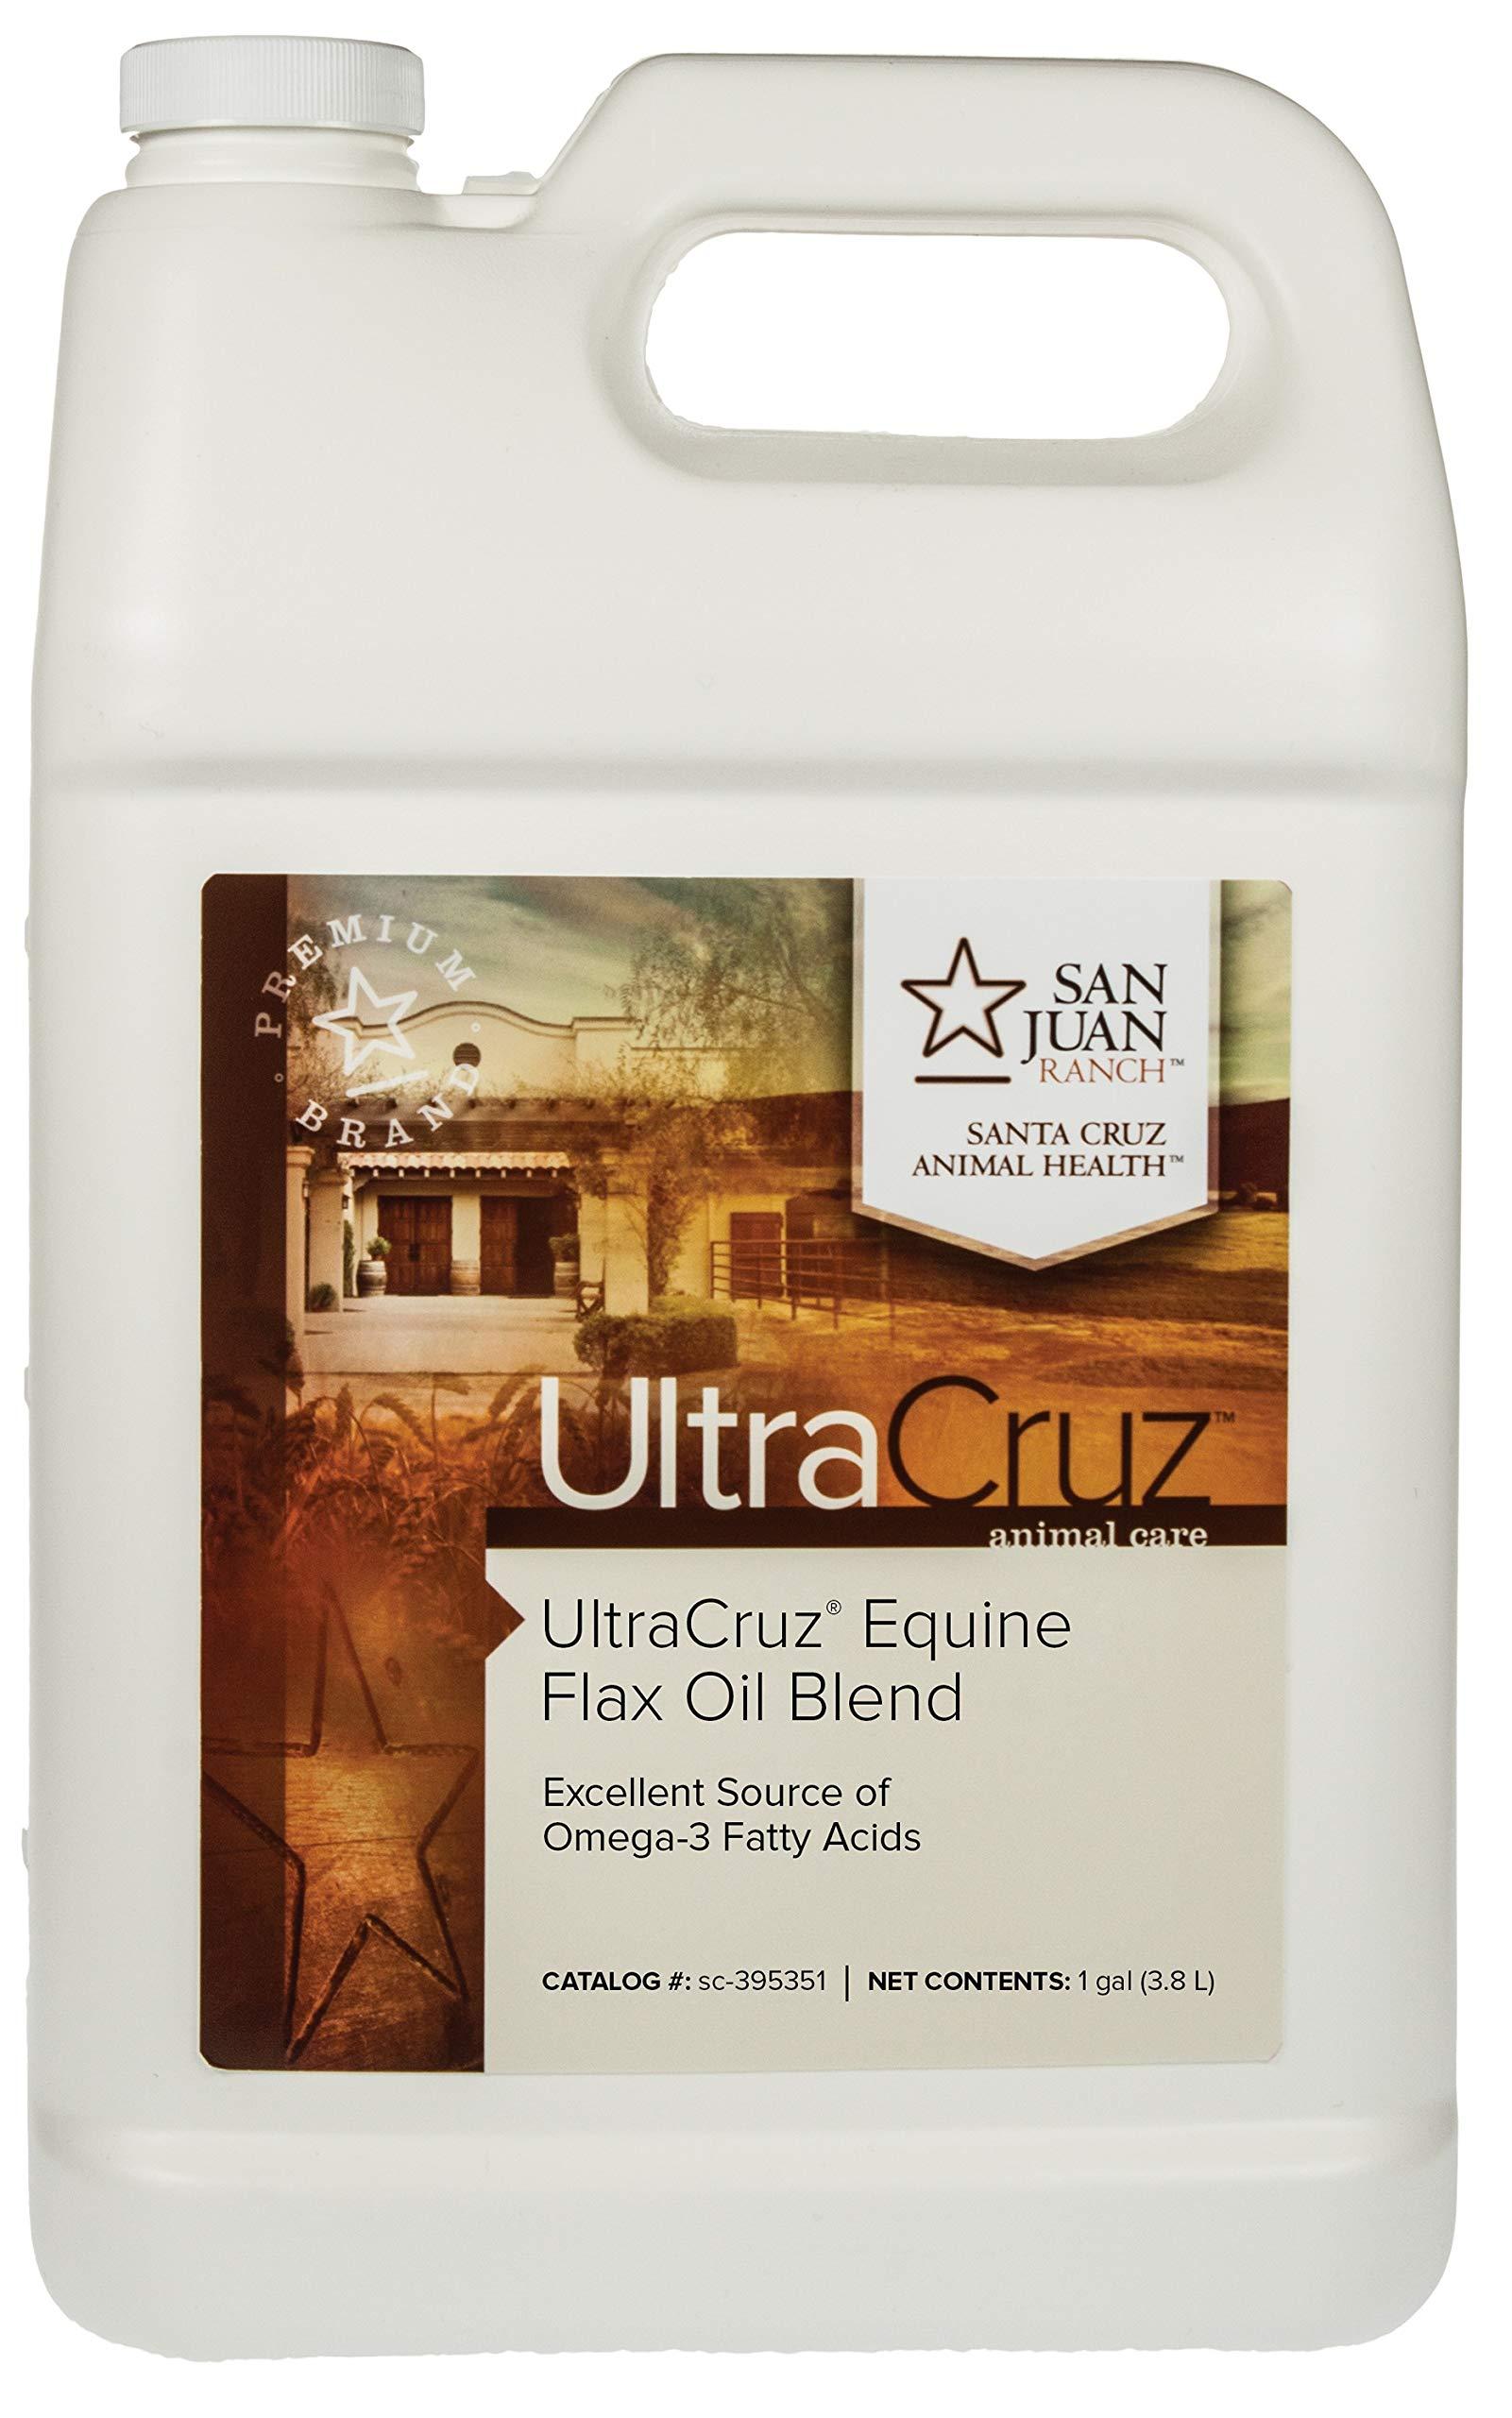 UltraCruz Flax Oil Blend Supplement for Horses and Livestock, 1 Gallon by UltraCruz